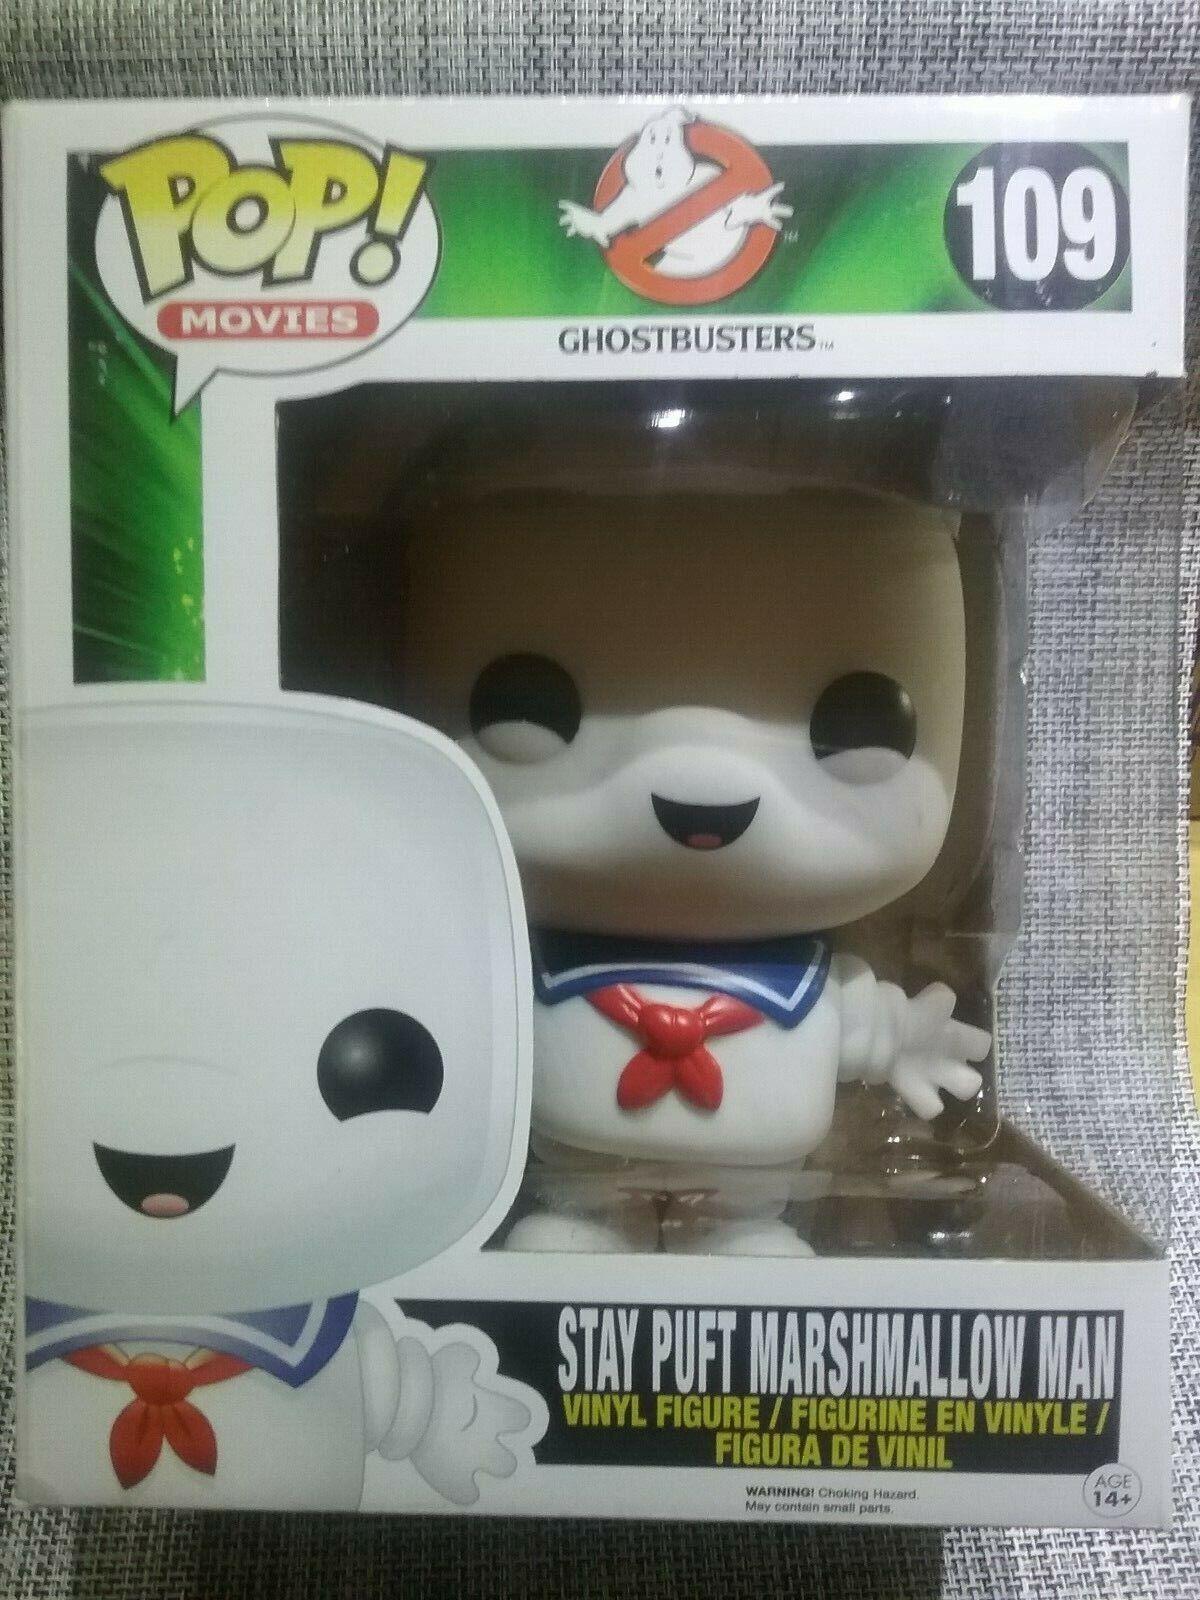 Funko Pop  Stay Puft Marshmallow Man  109 Ghostbusters